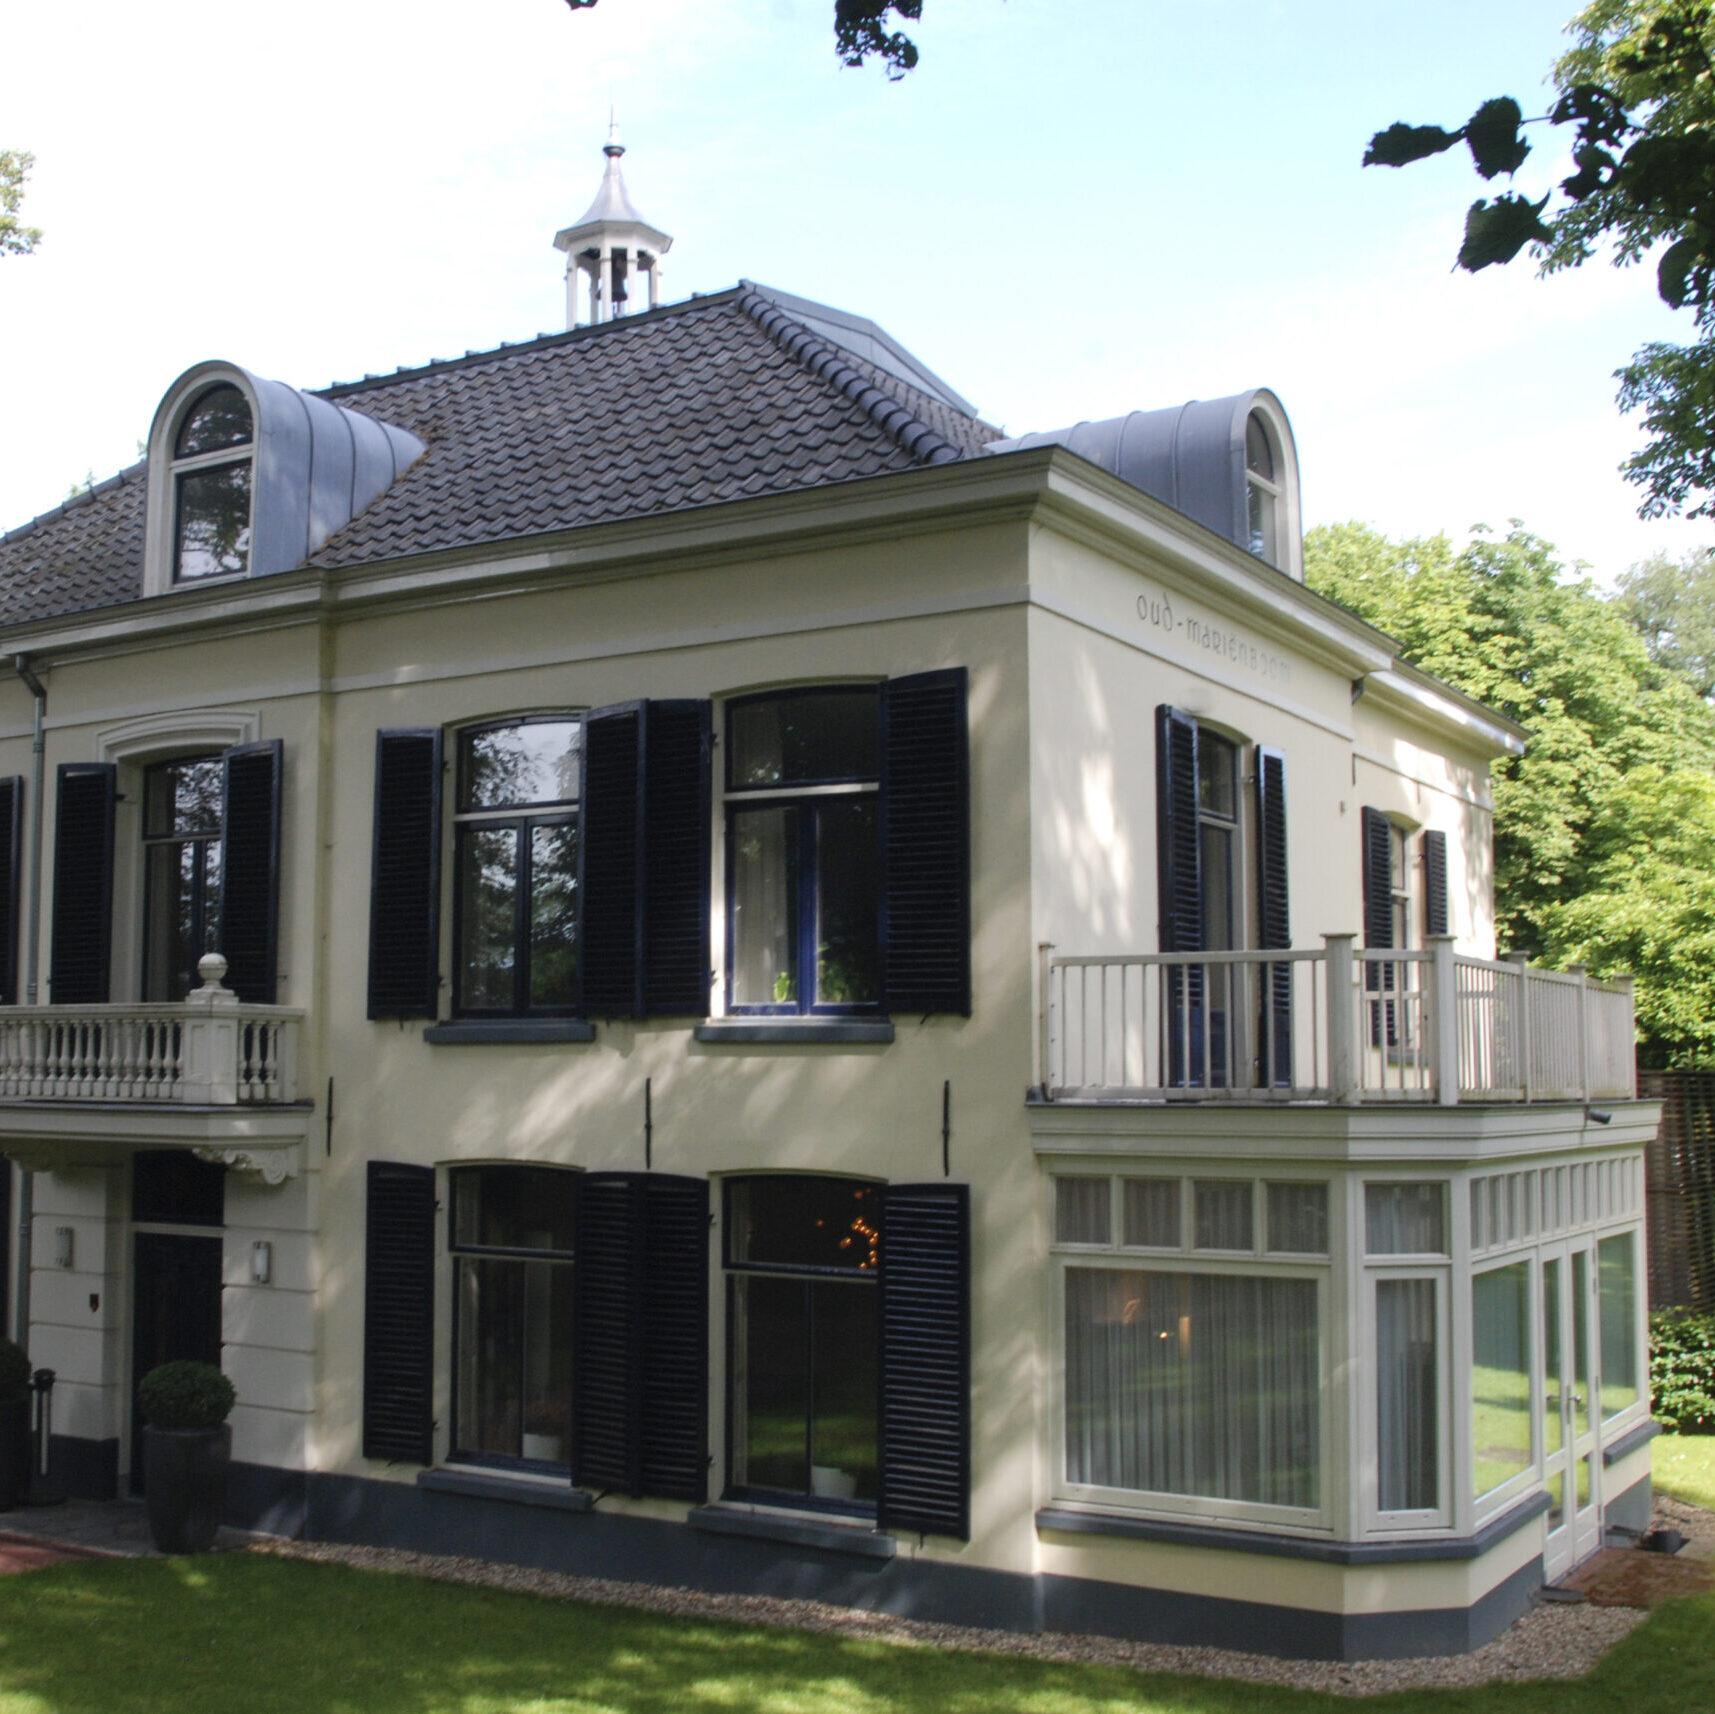 50.1 Villa Oud-Mariënboom